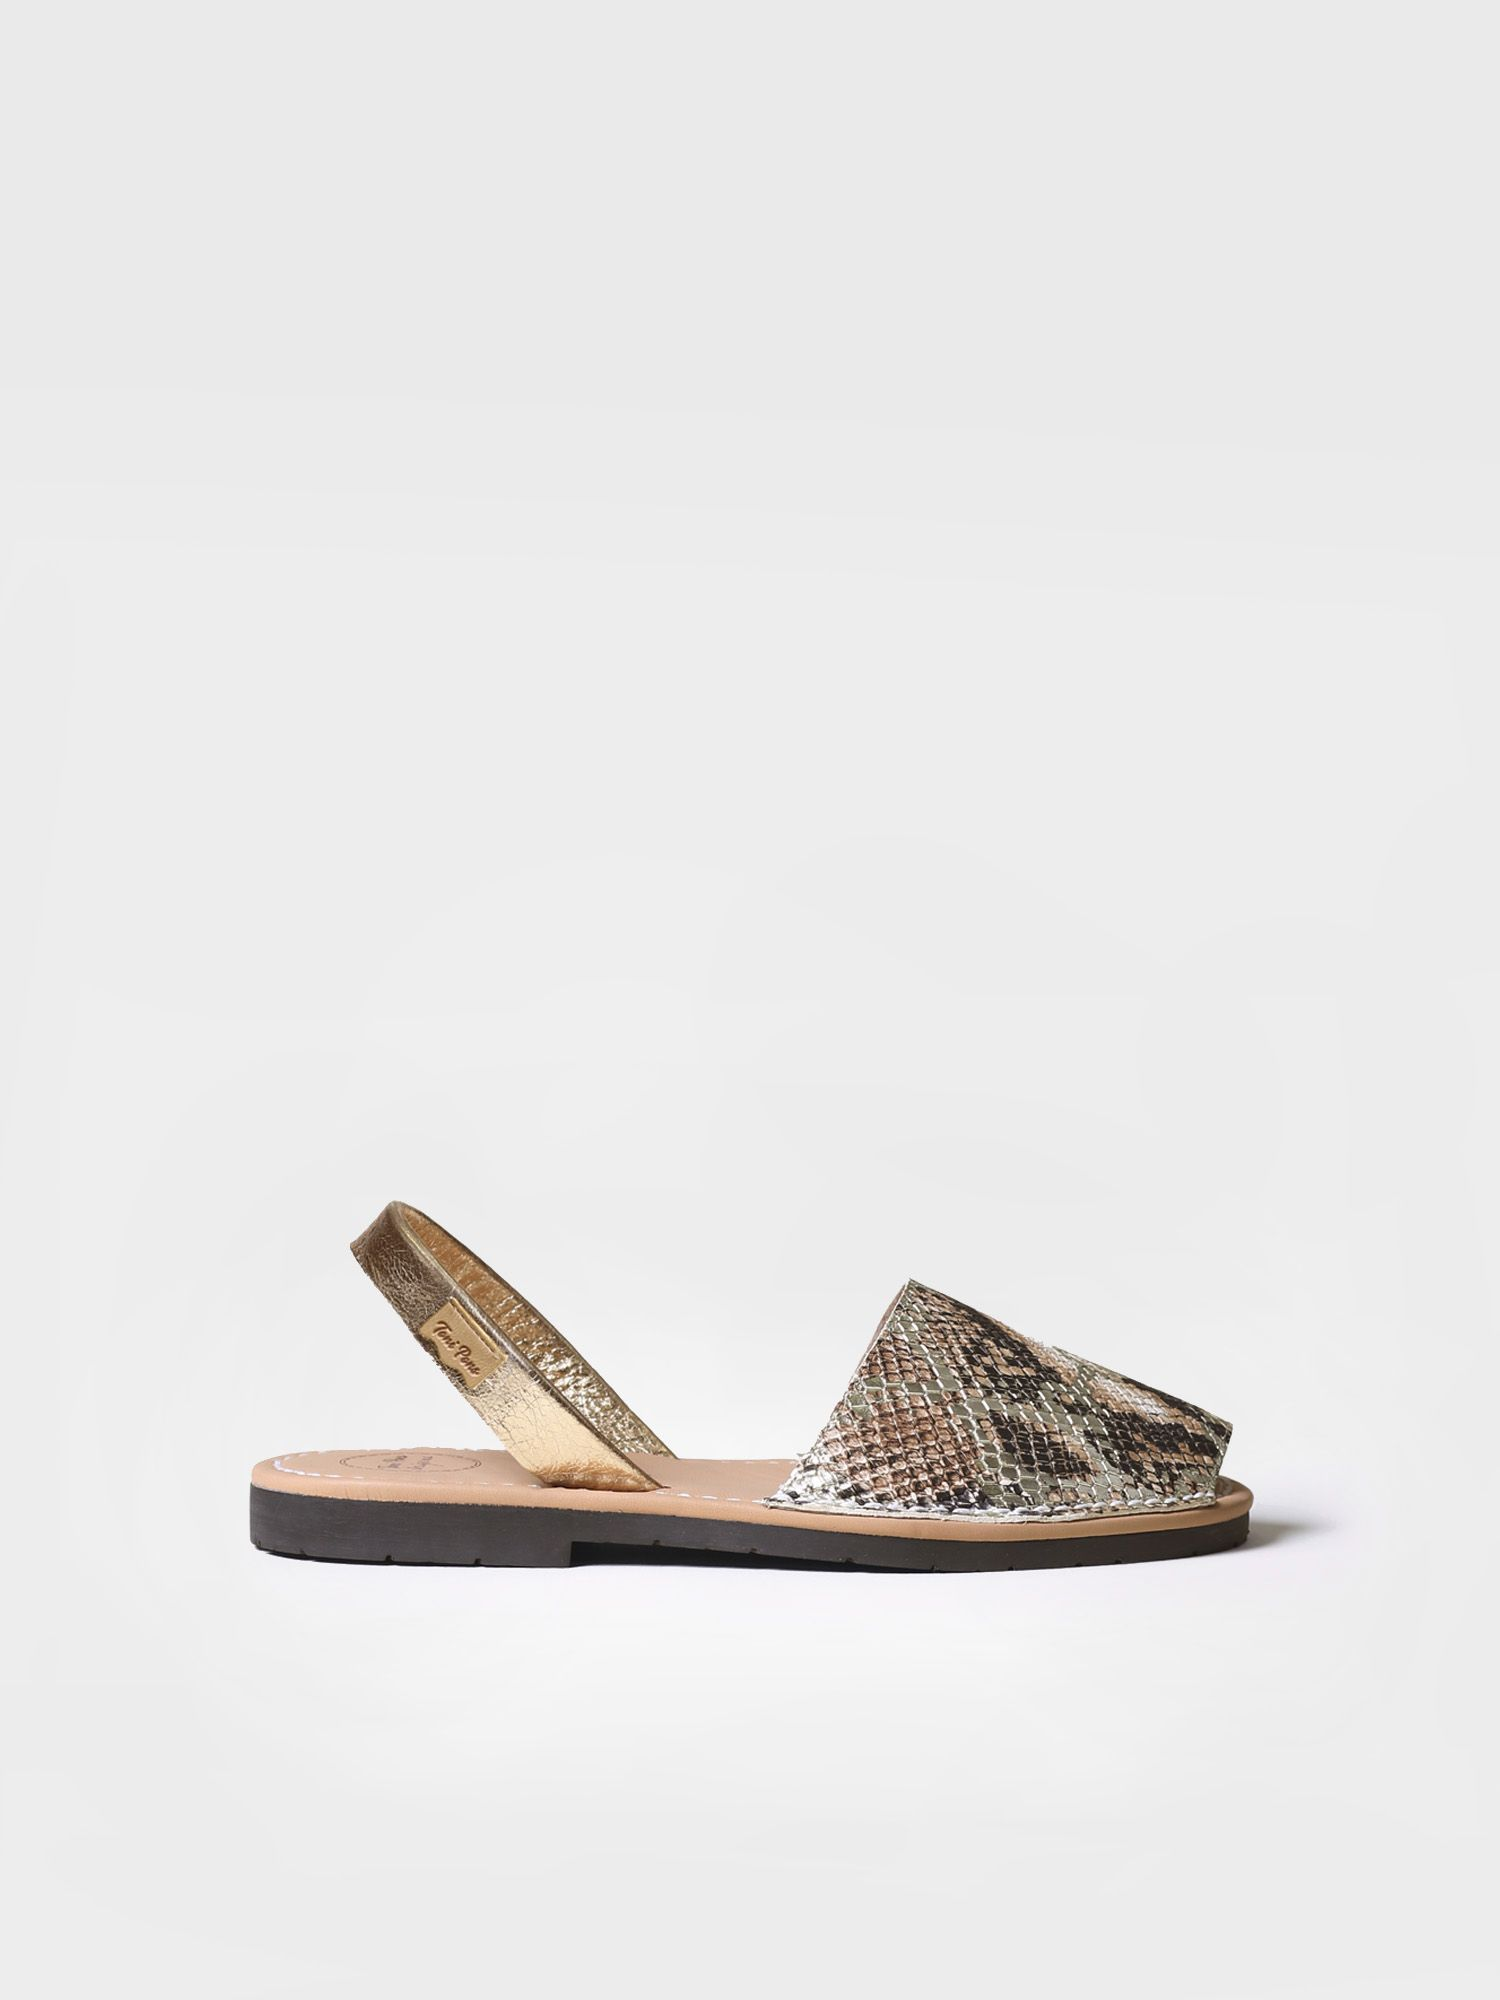 Leather menorquine sandal - MAO-MK